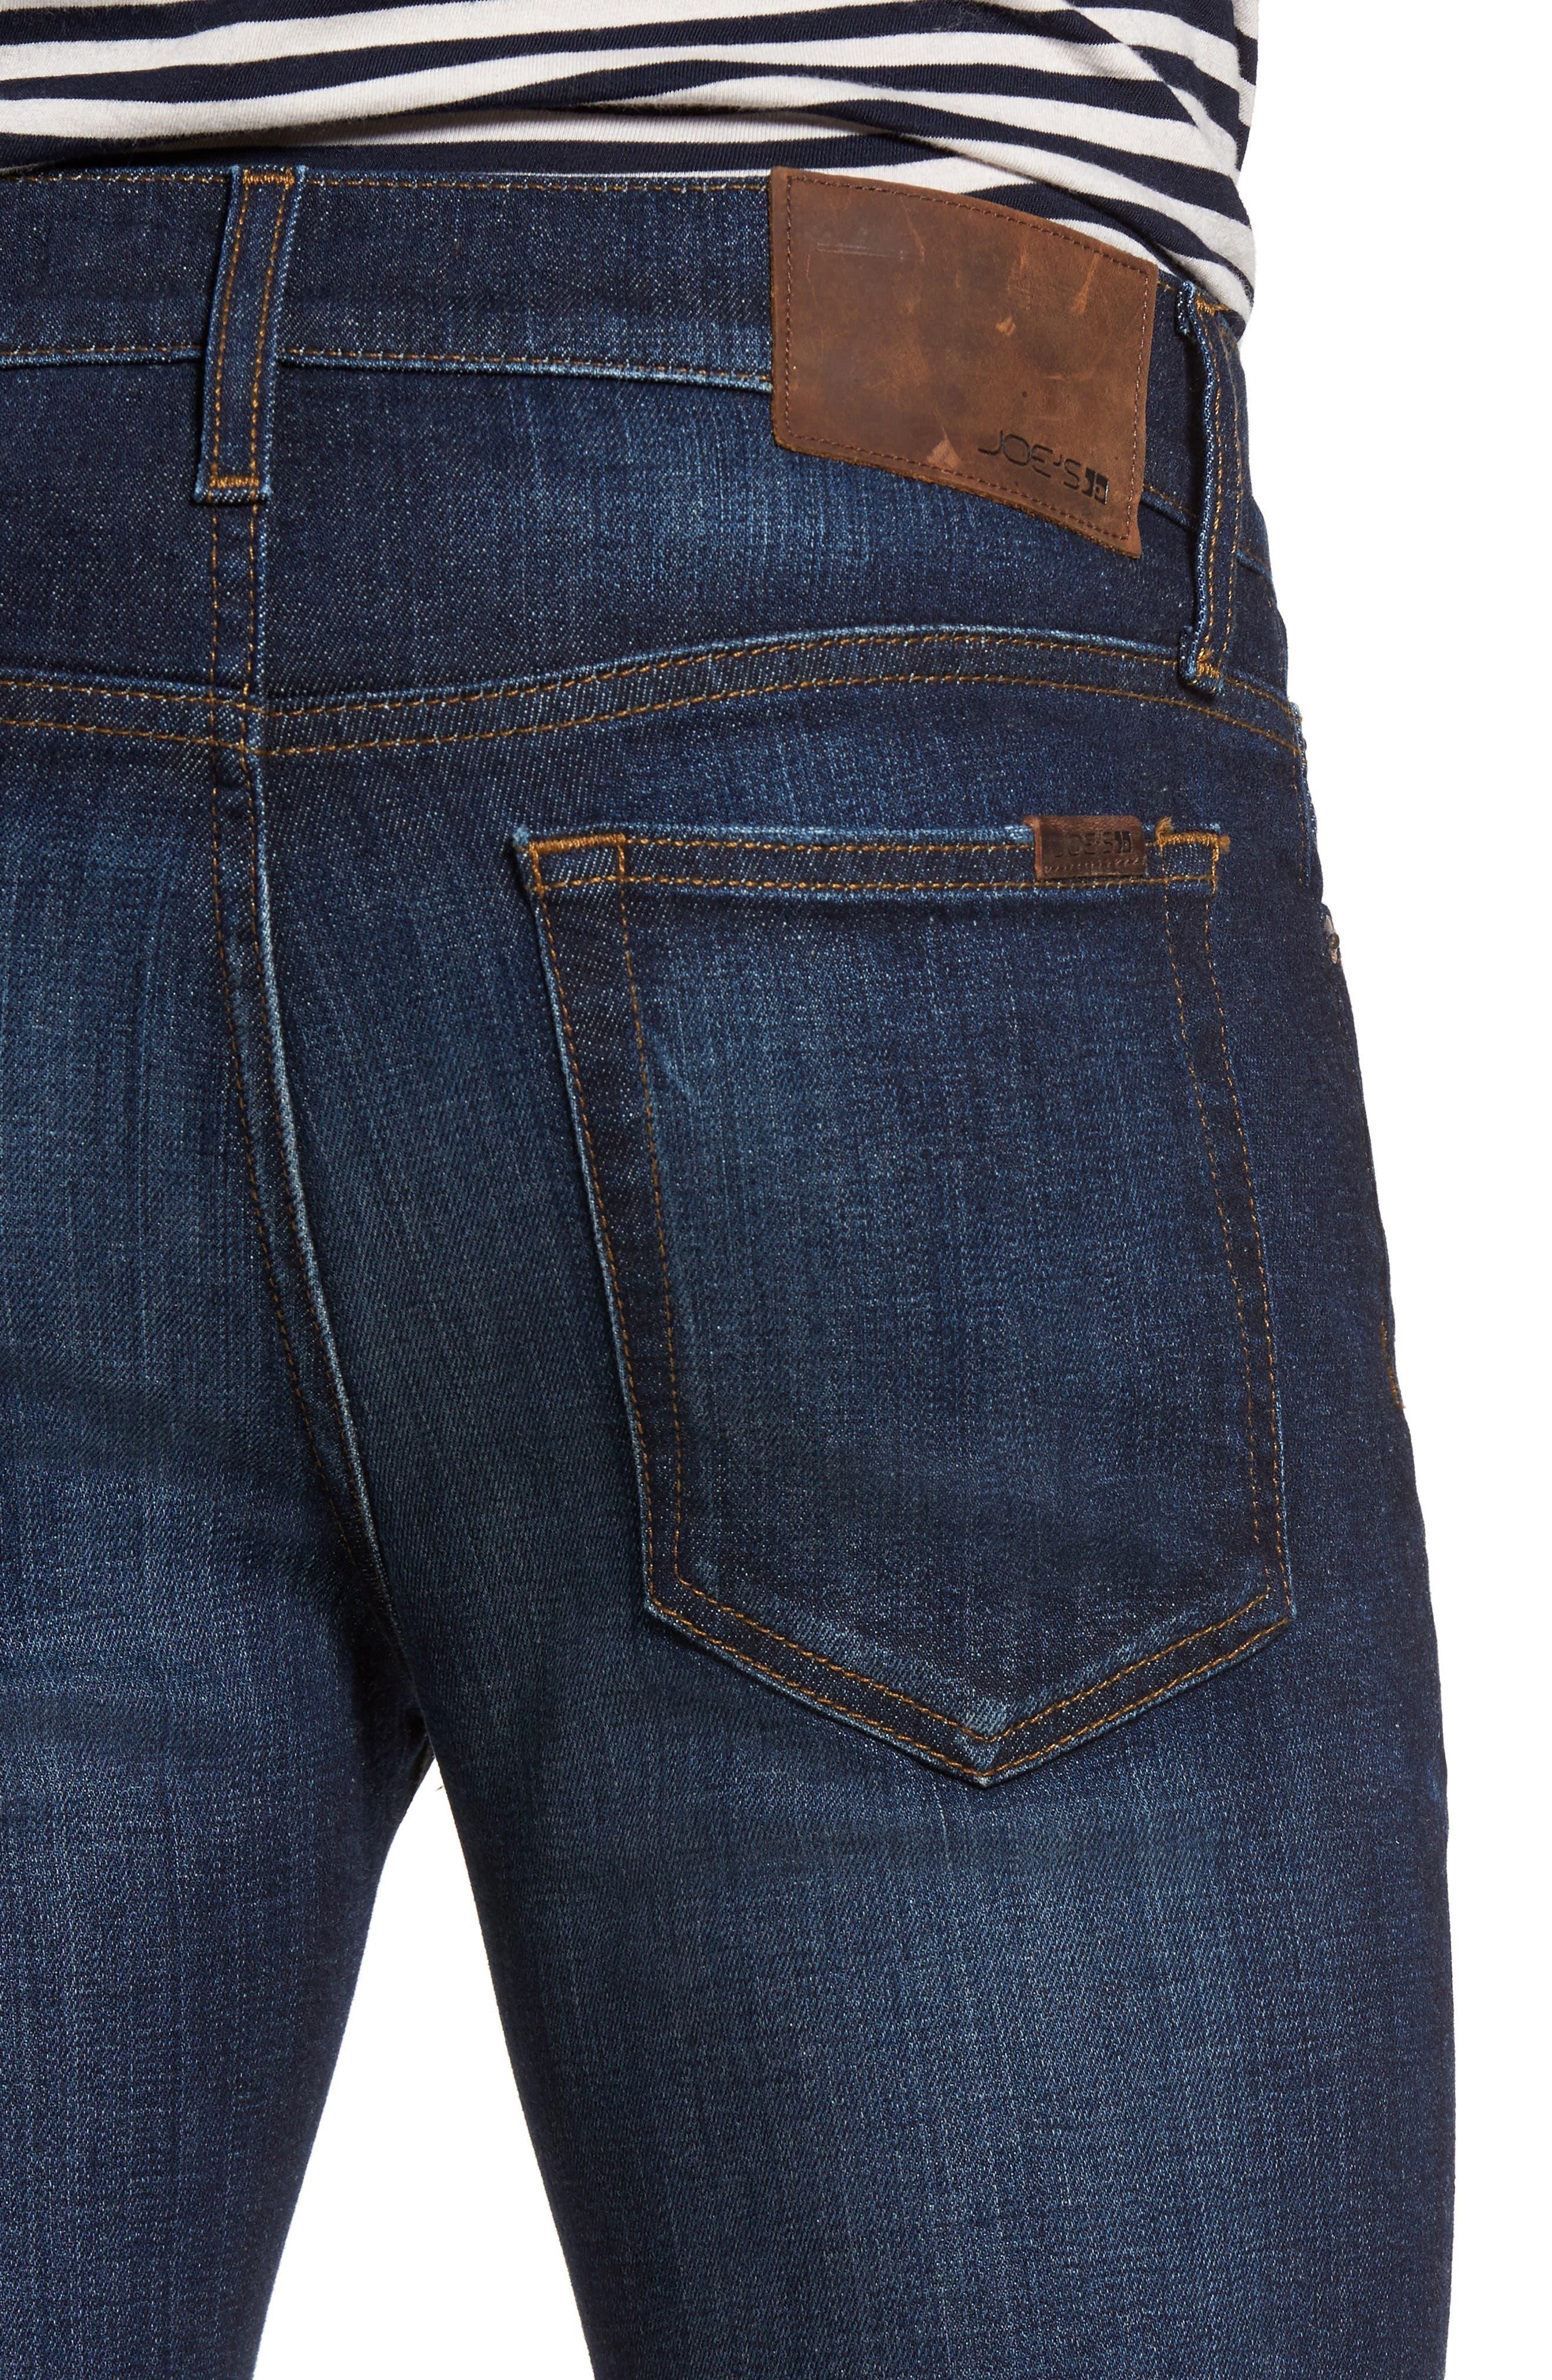 Classic Straight Leg Jeans,                             Alternate thumbnail 4, color,